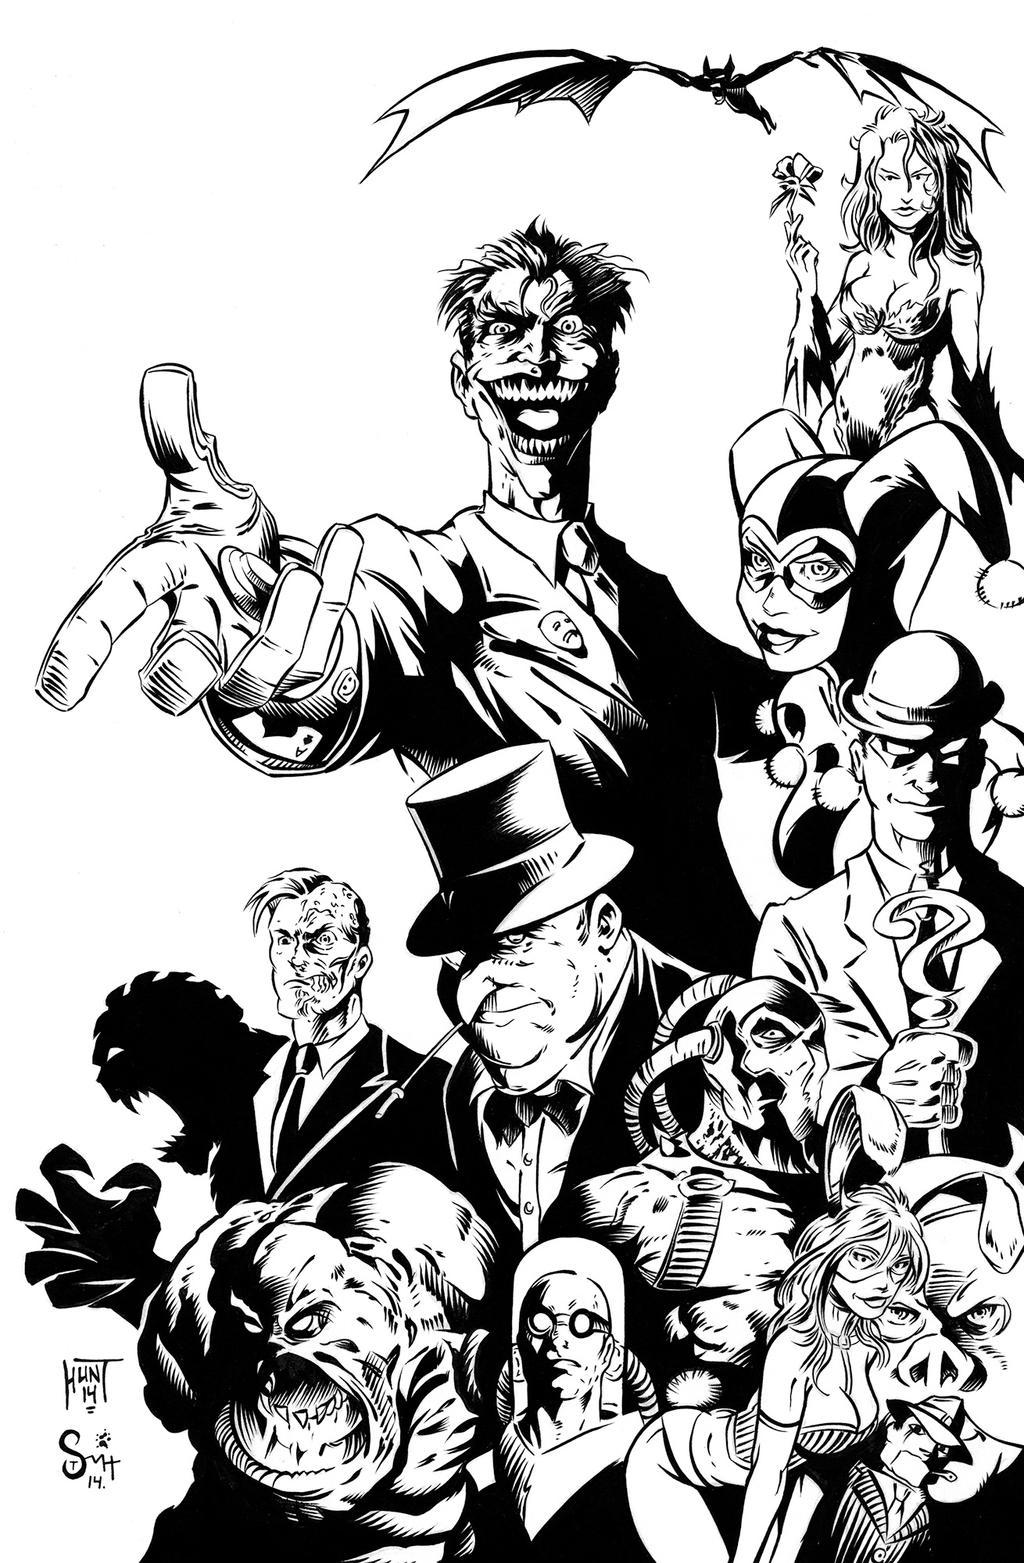 Batman: Rogues Gallery Pencils - Hunt / Smith by Travinapple